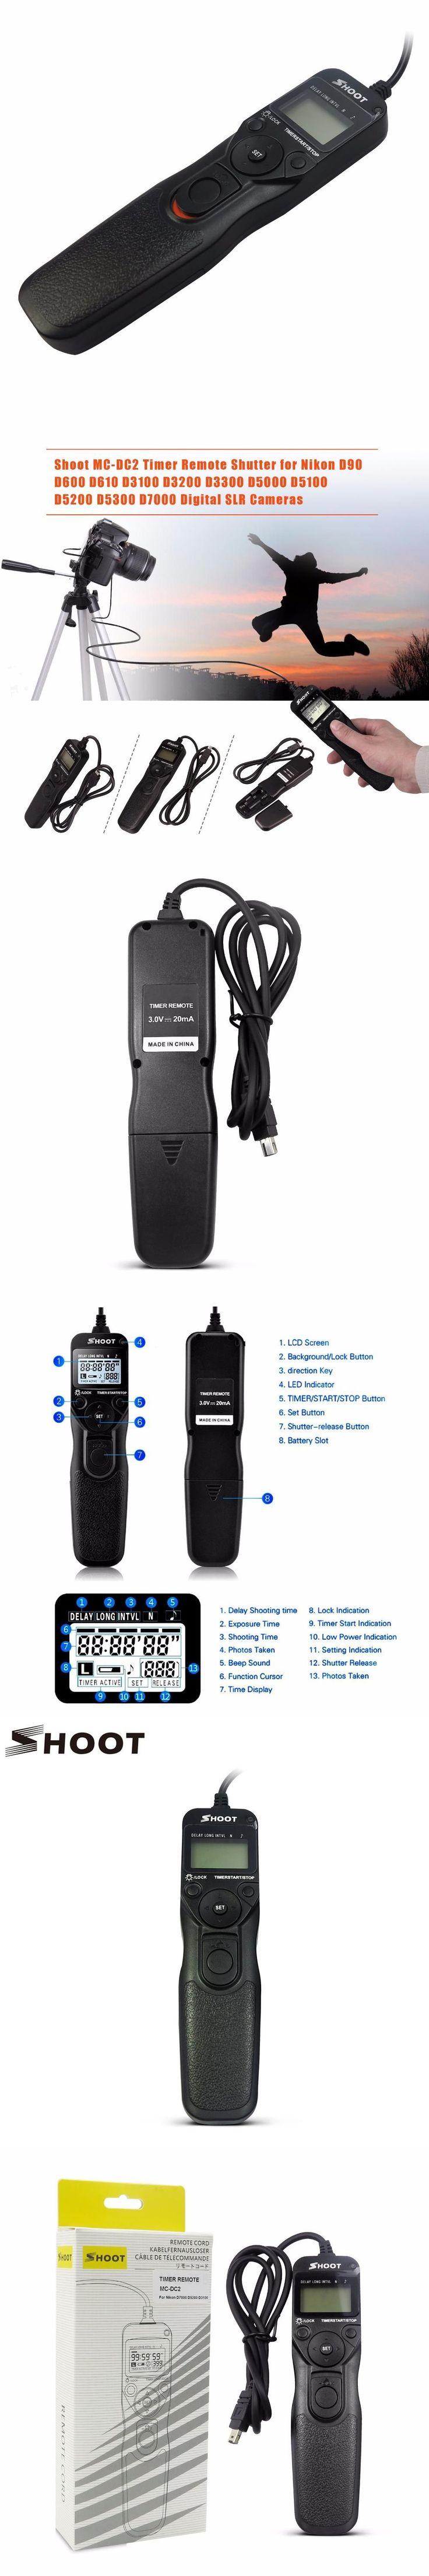 SHOOT MC-DC2 Timer Remote Shutter for Nikon D3100 D7000 D90 D600 D610 D3200 D3300 D5000 D5100 D5200 D5300 Digital SLR Cameras